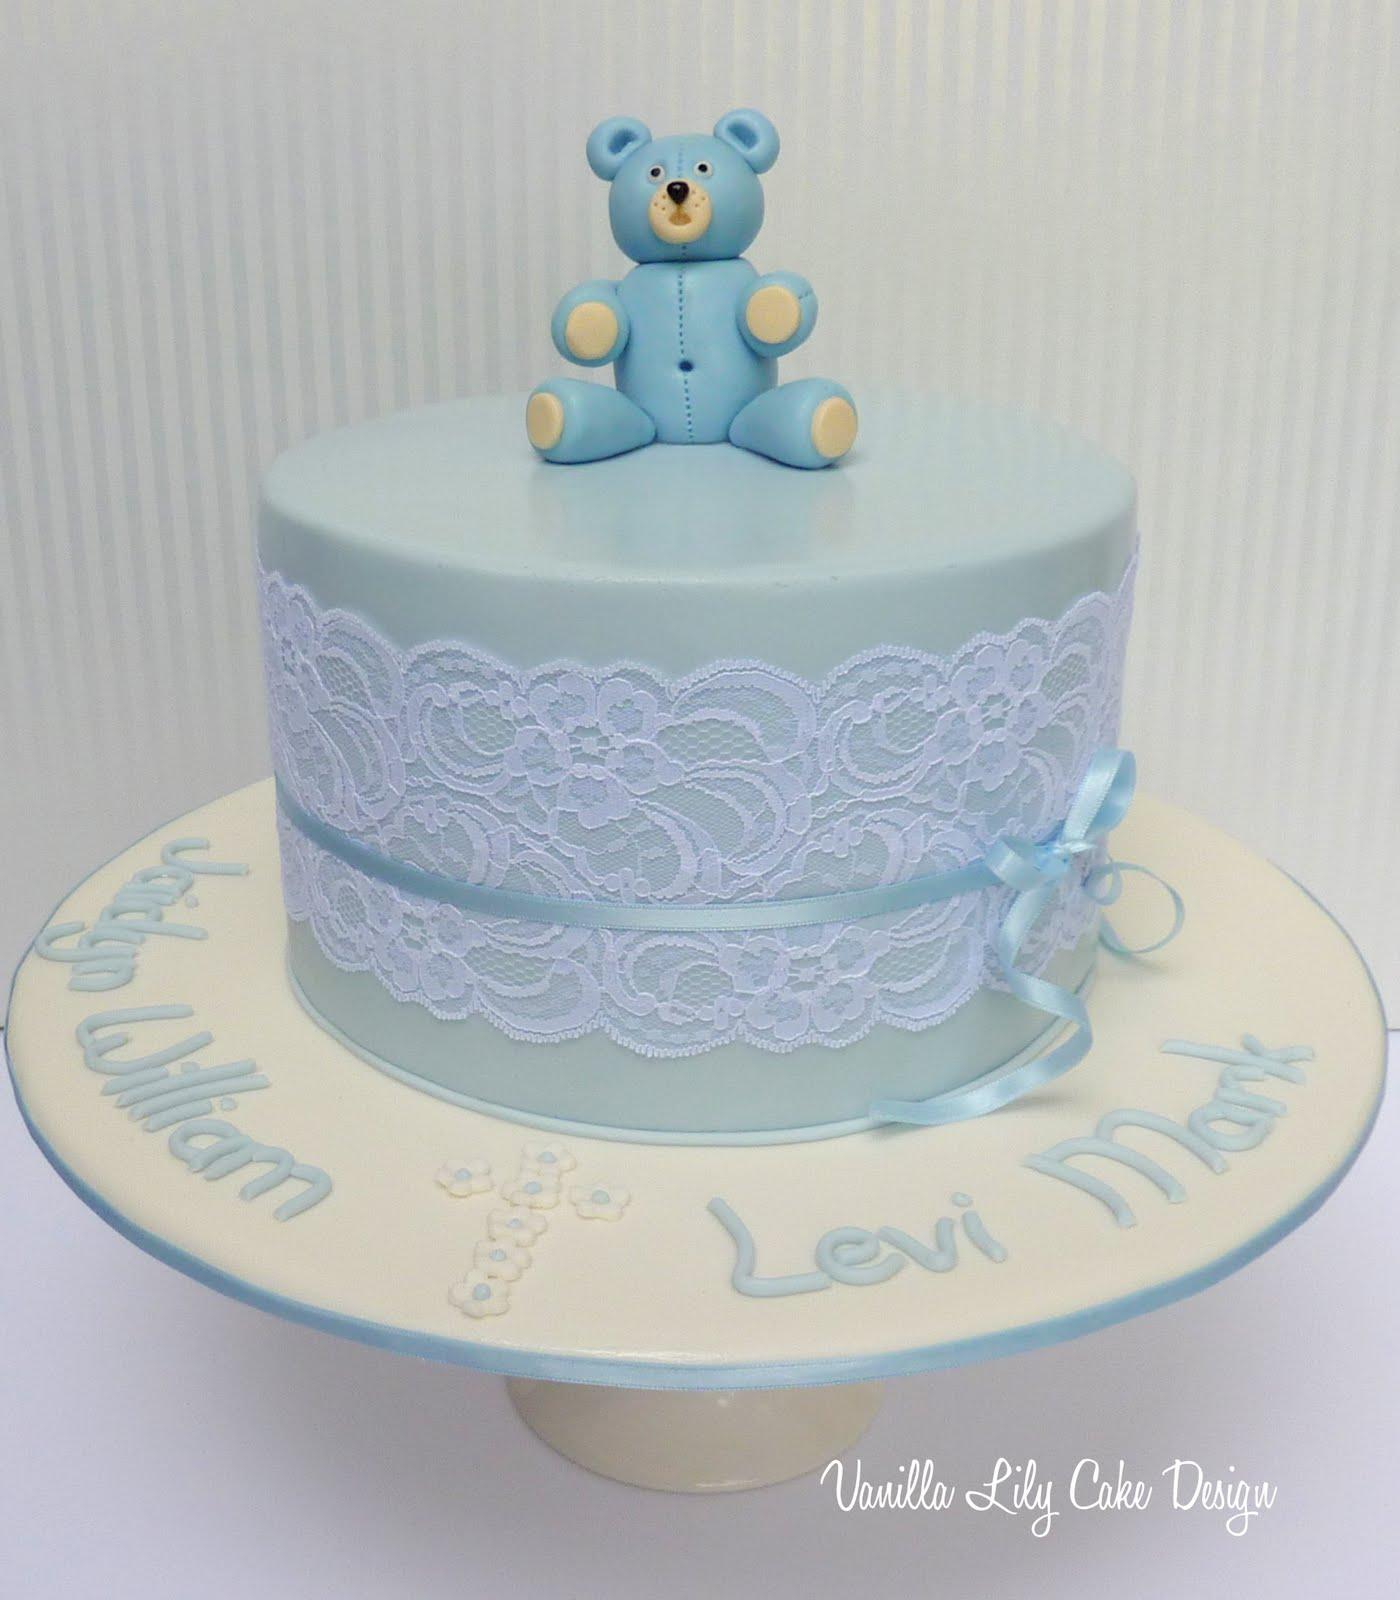 Vanilla Lily Cake Design January